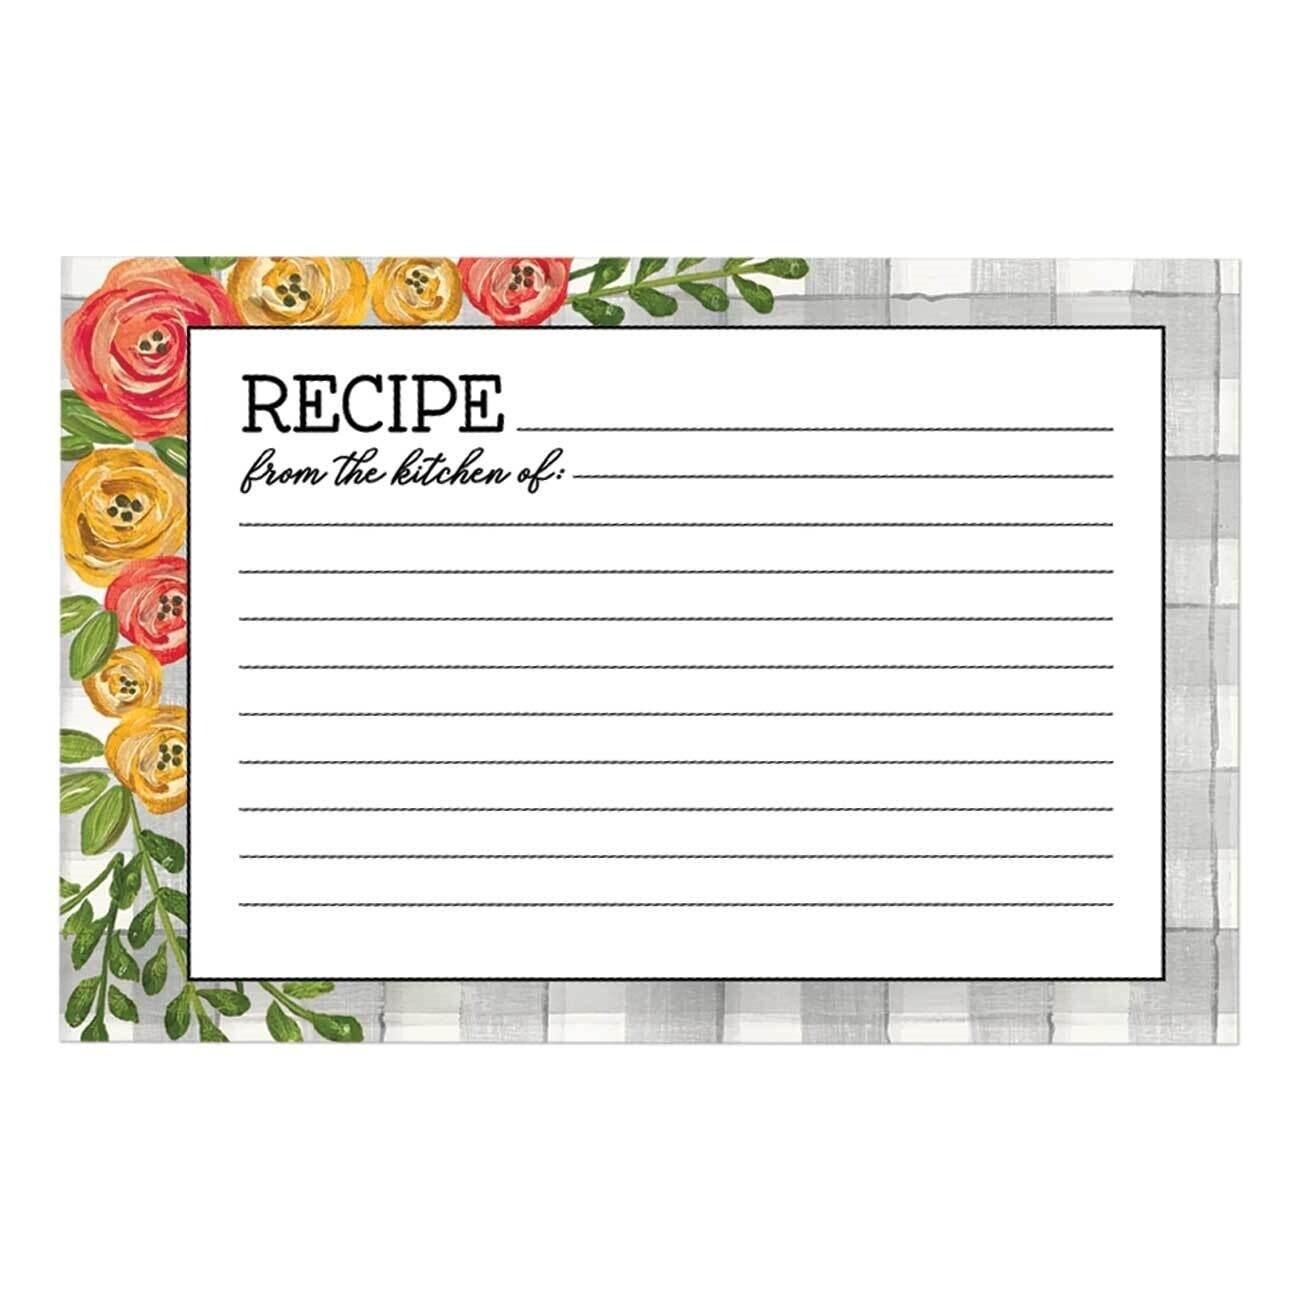 Brownlow Recipe Cards - Floral